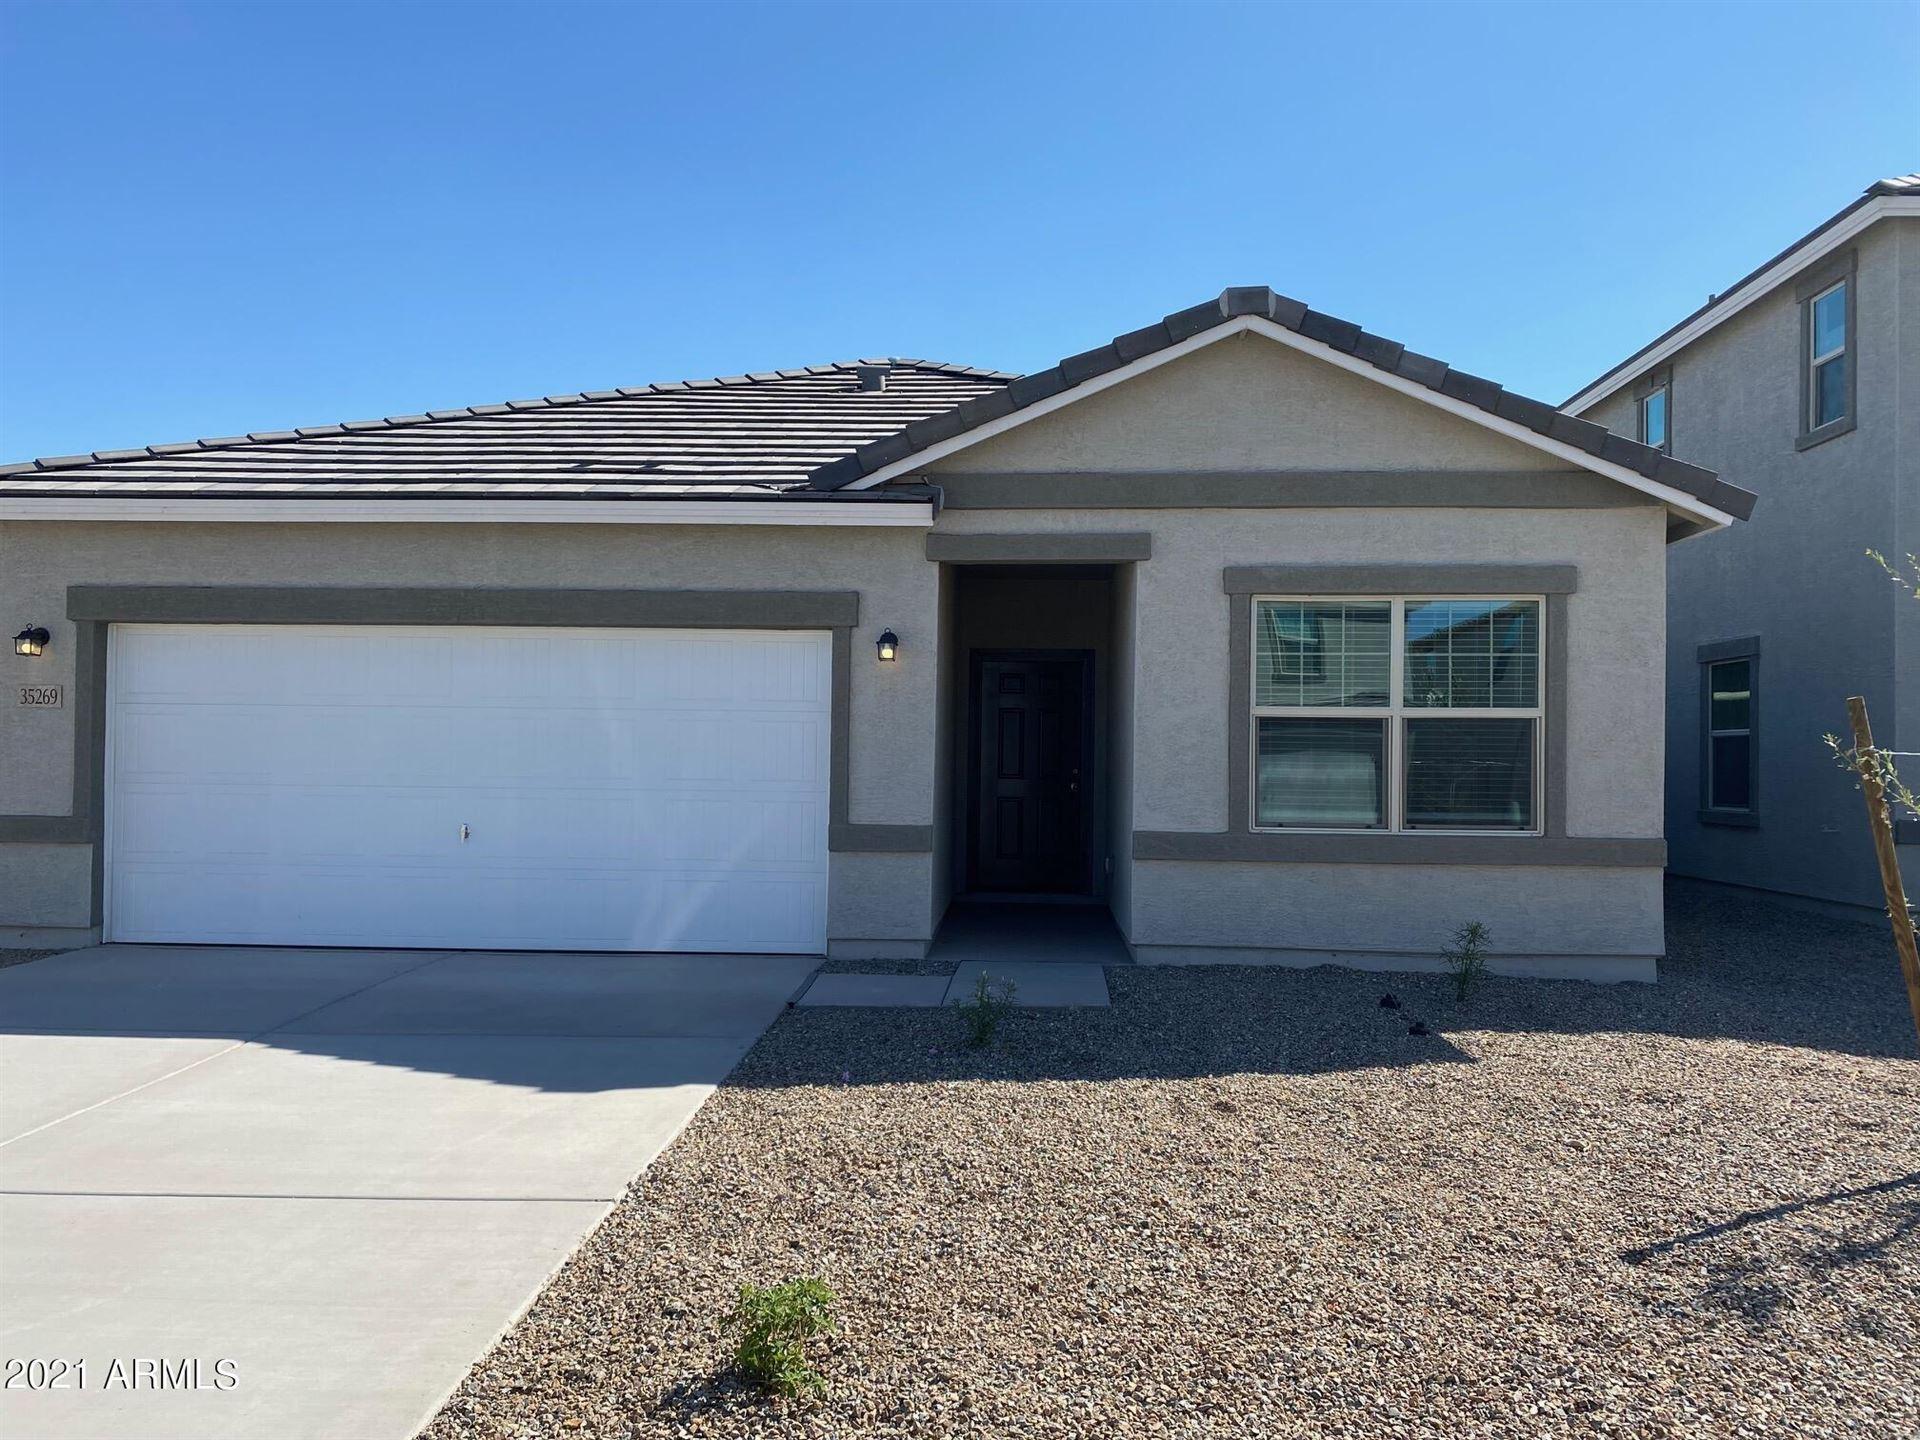 Photo for 35269 W SANTA CLARA Avenue W, Maricopa, AZ 85138 (MLS # 6299137)